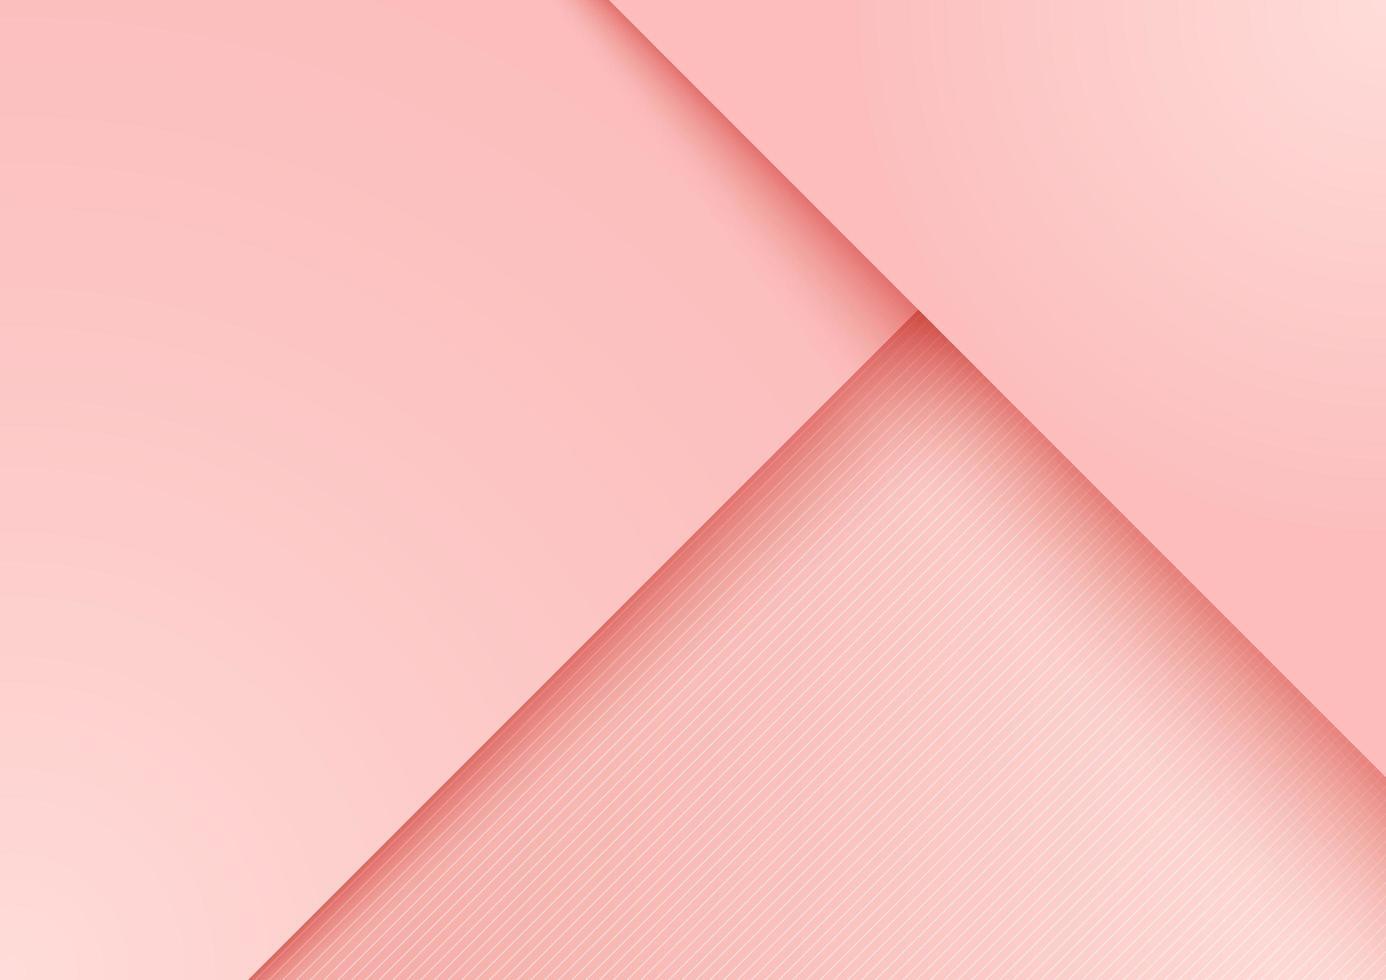 rosa papper överlappande lager bakgrund vektor